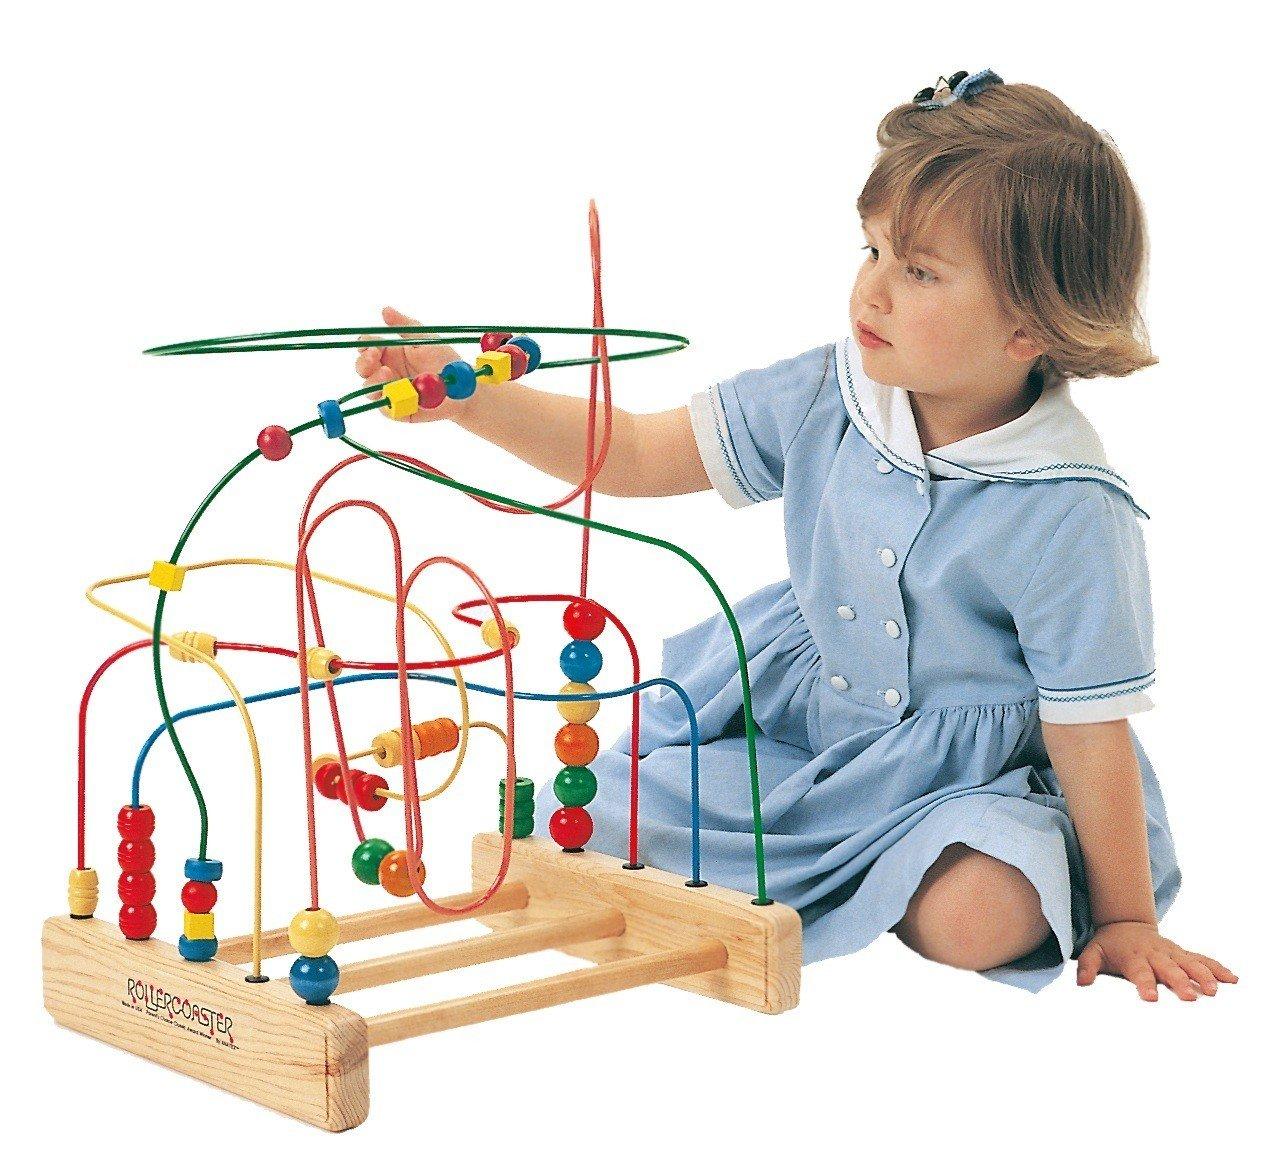 Amazon.com: Anatex The Original Rollercoaster: Toys & Games